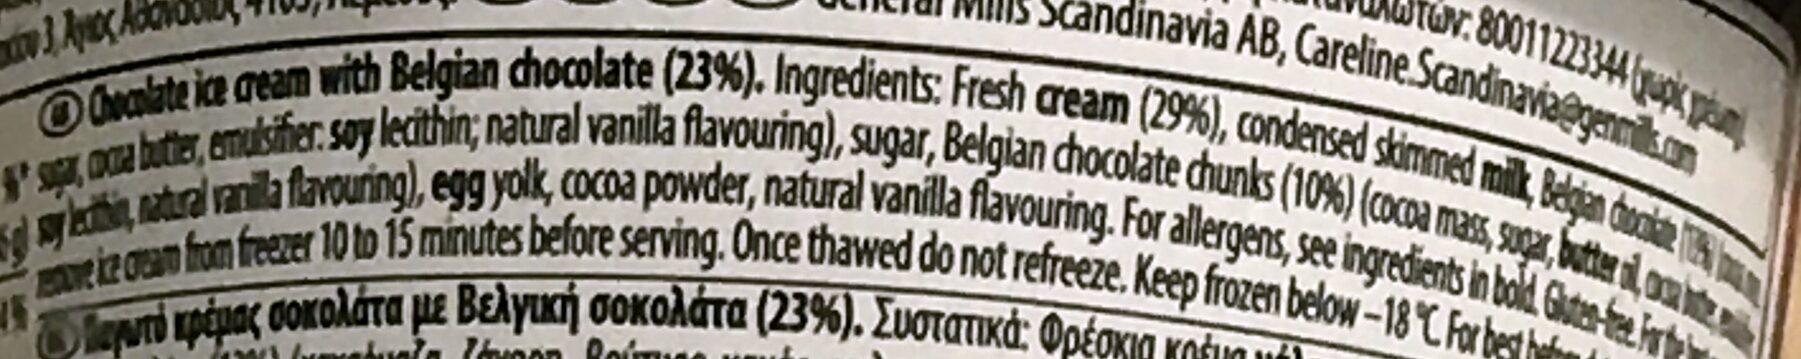 Belgian Chocolate Ice Cream - Ingredients - en